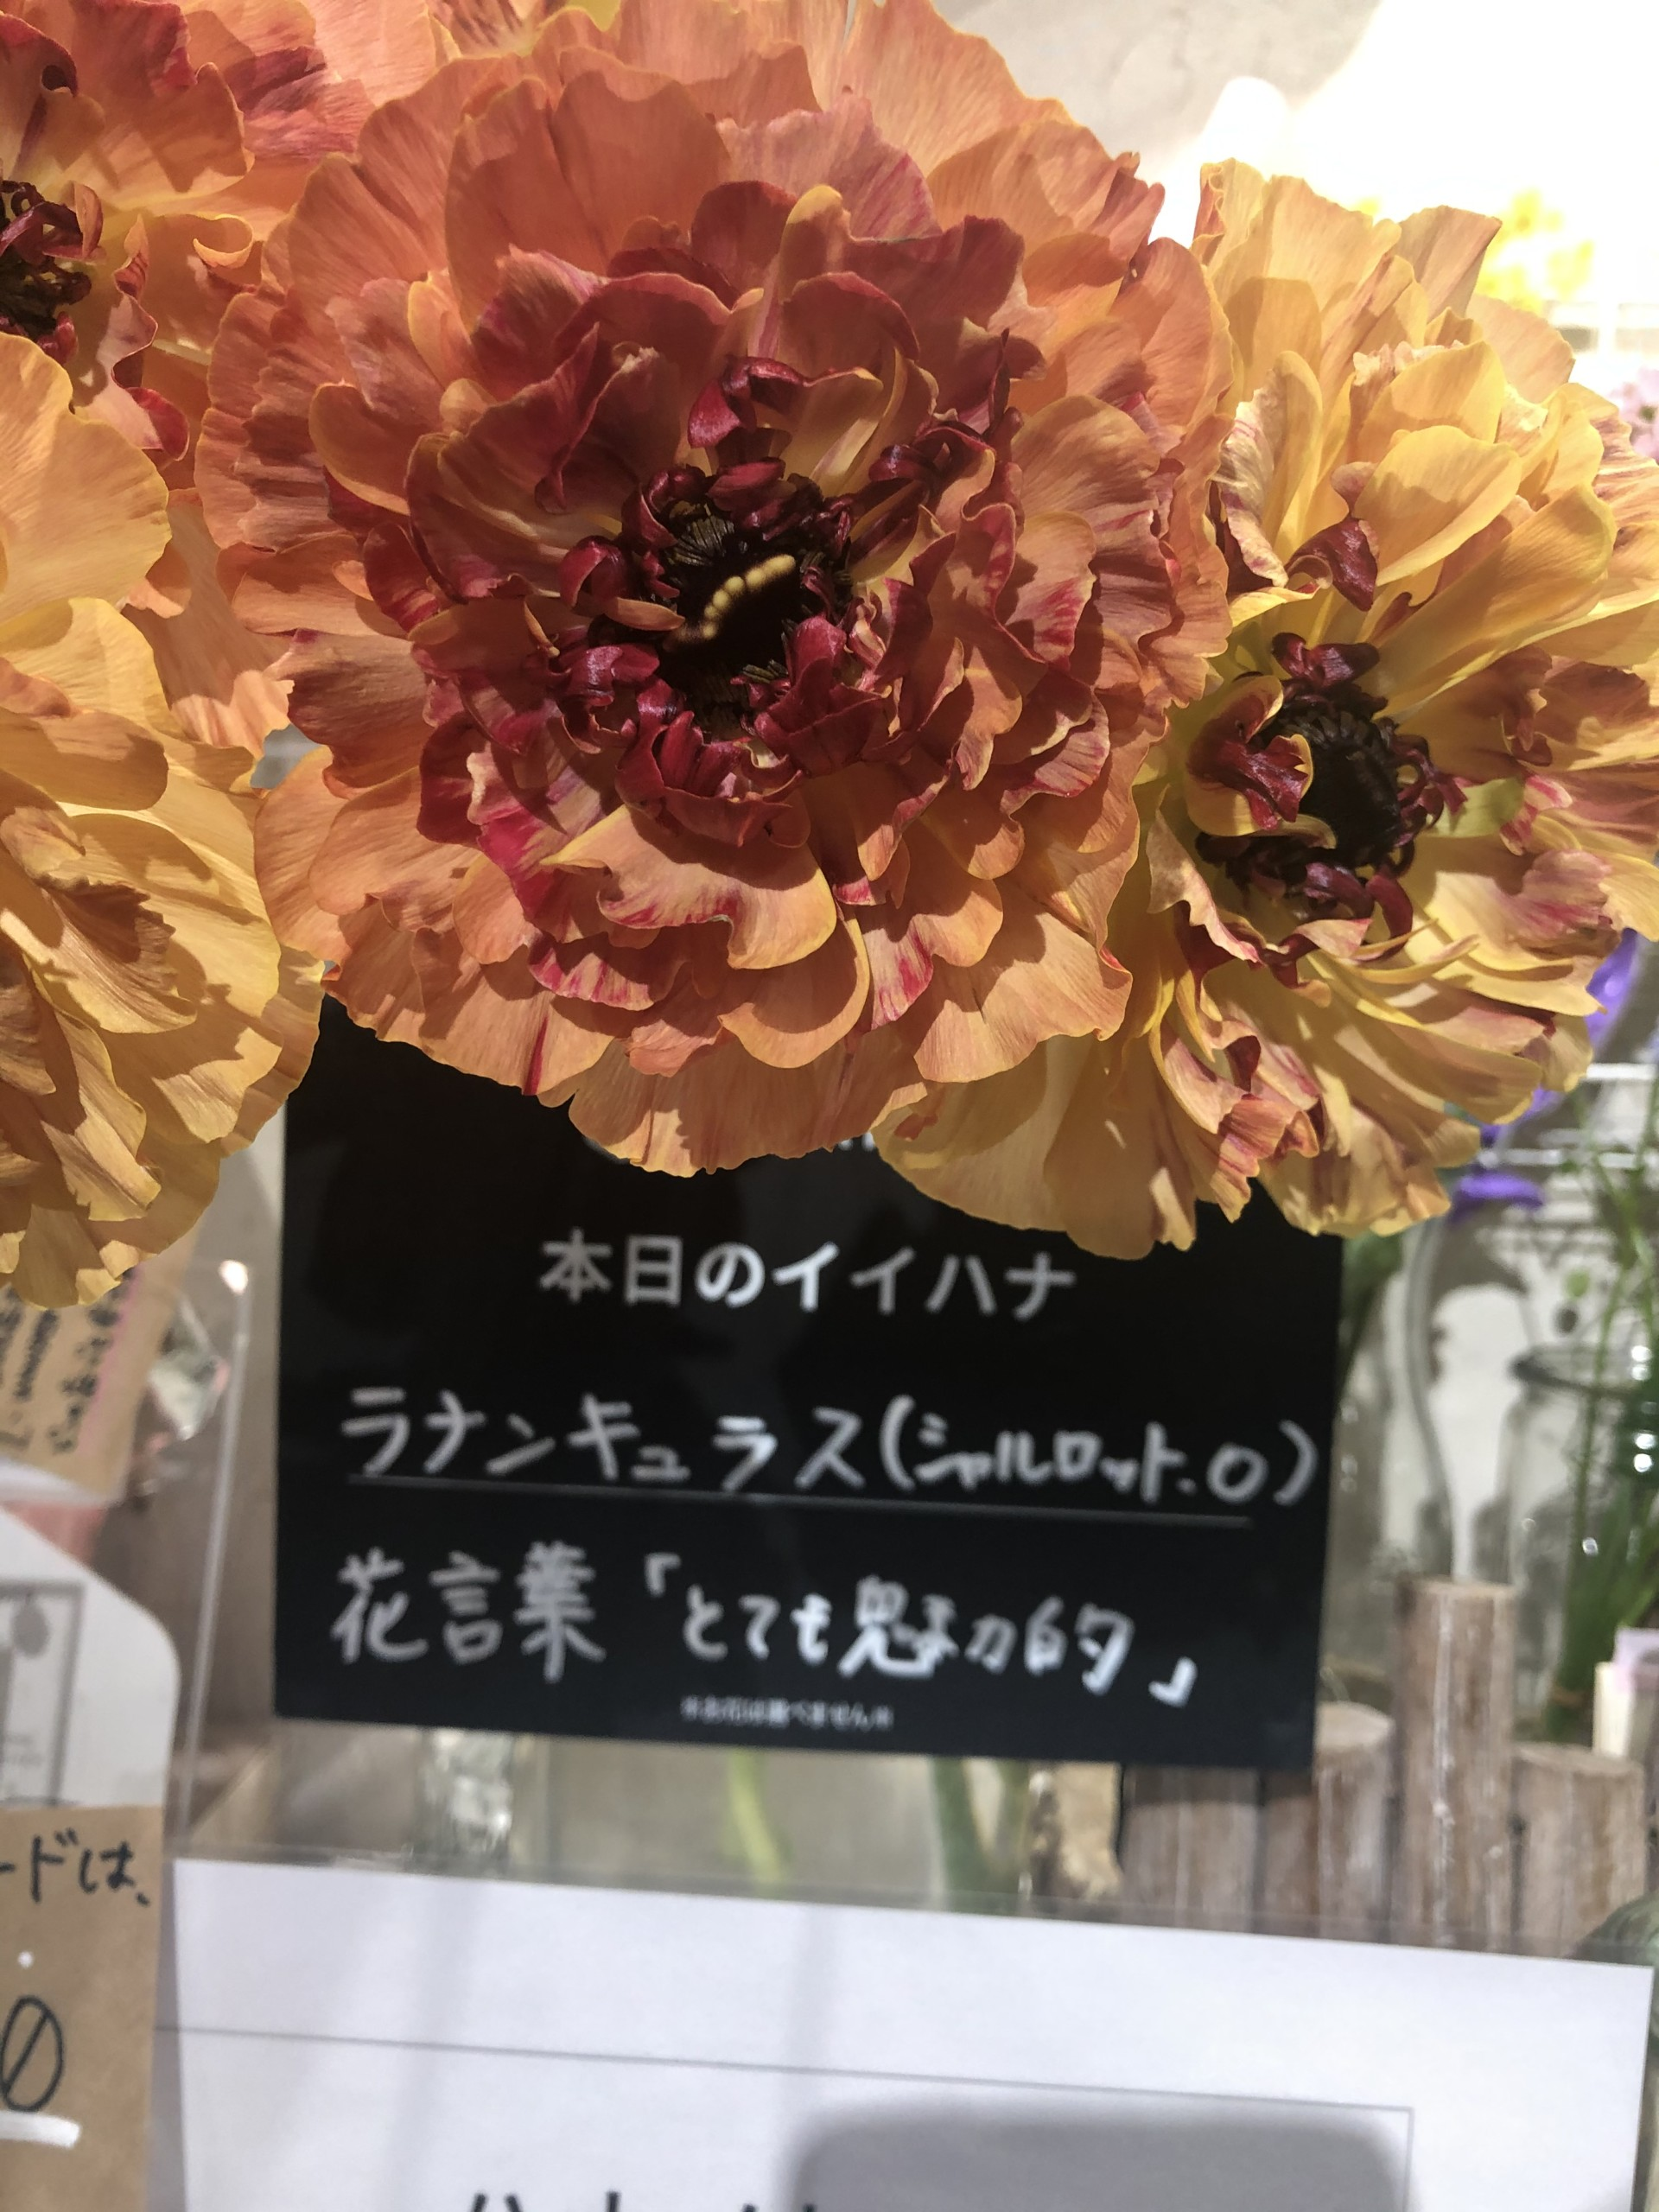 ⭐️美幸サロン【ソフィア・ミューズ目黒】⭐️